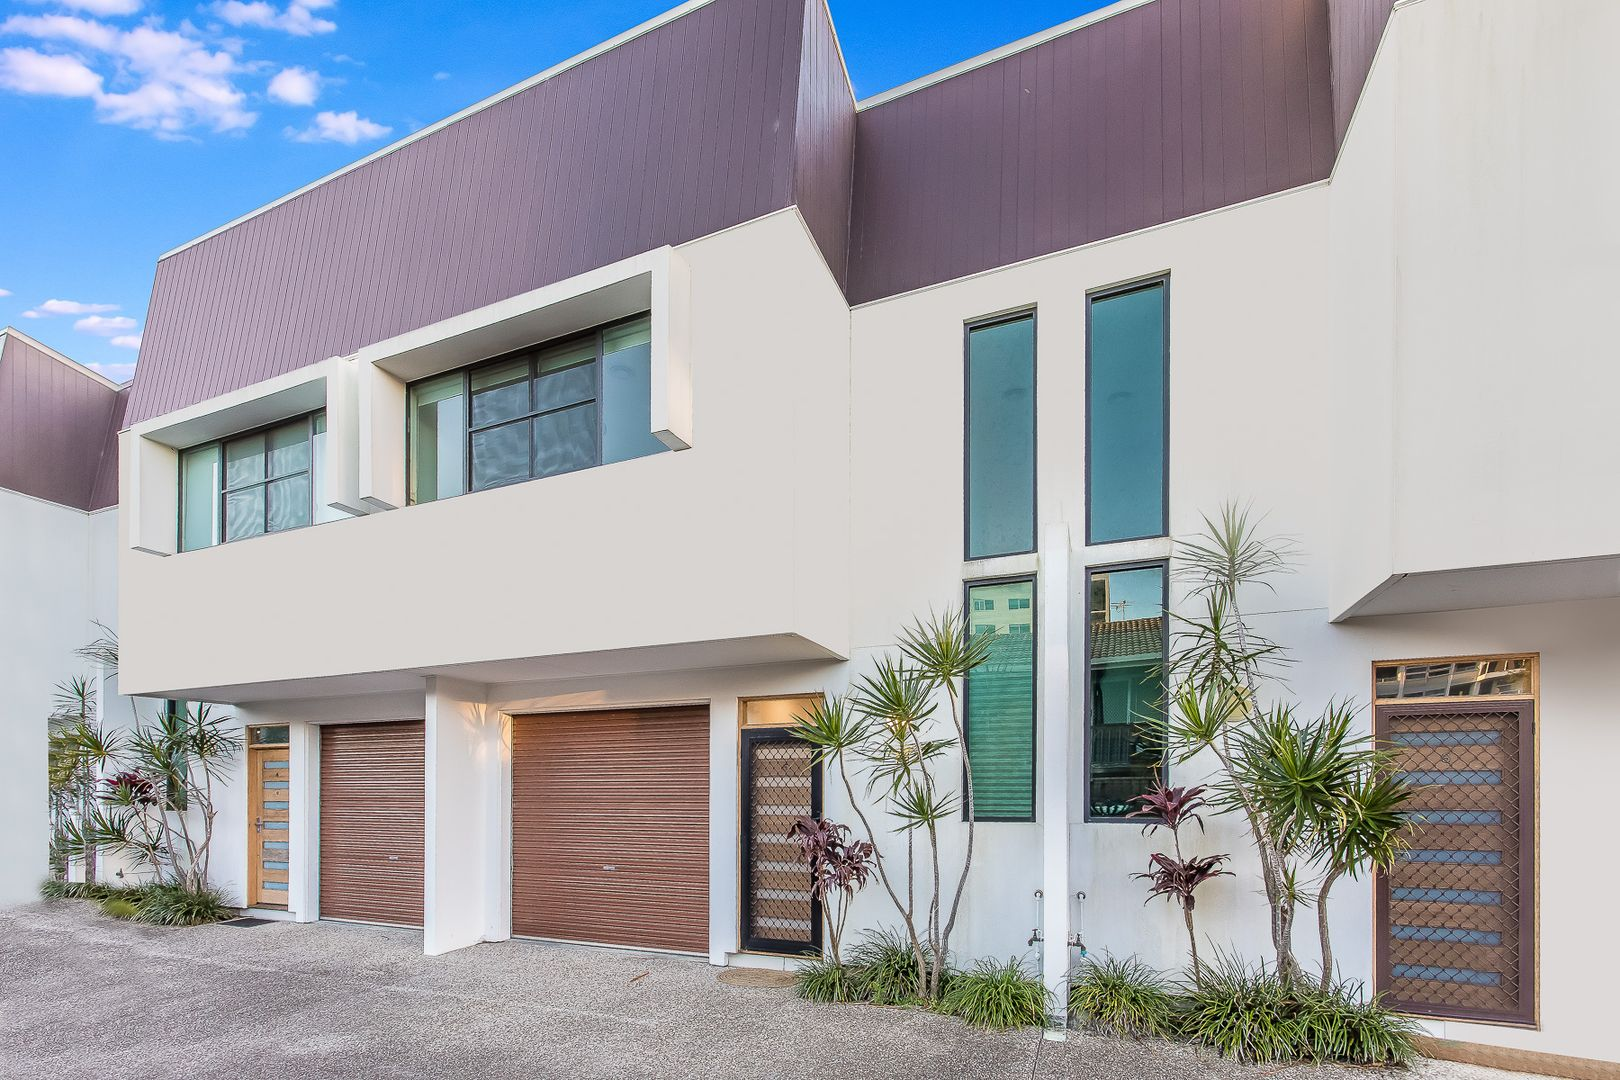 5/148 Mein Street, Scarborough QLD 4020, Image 1